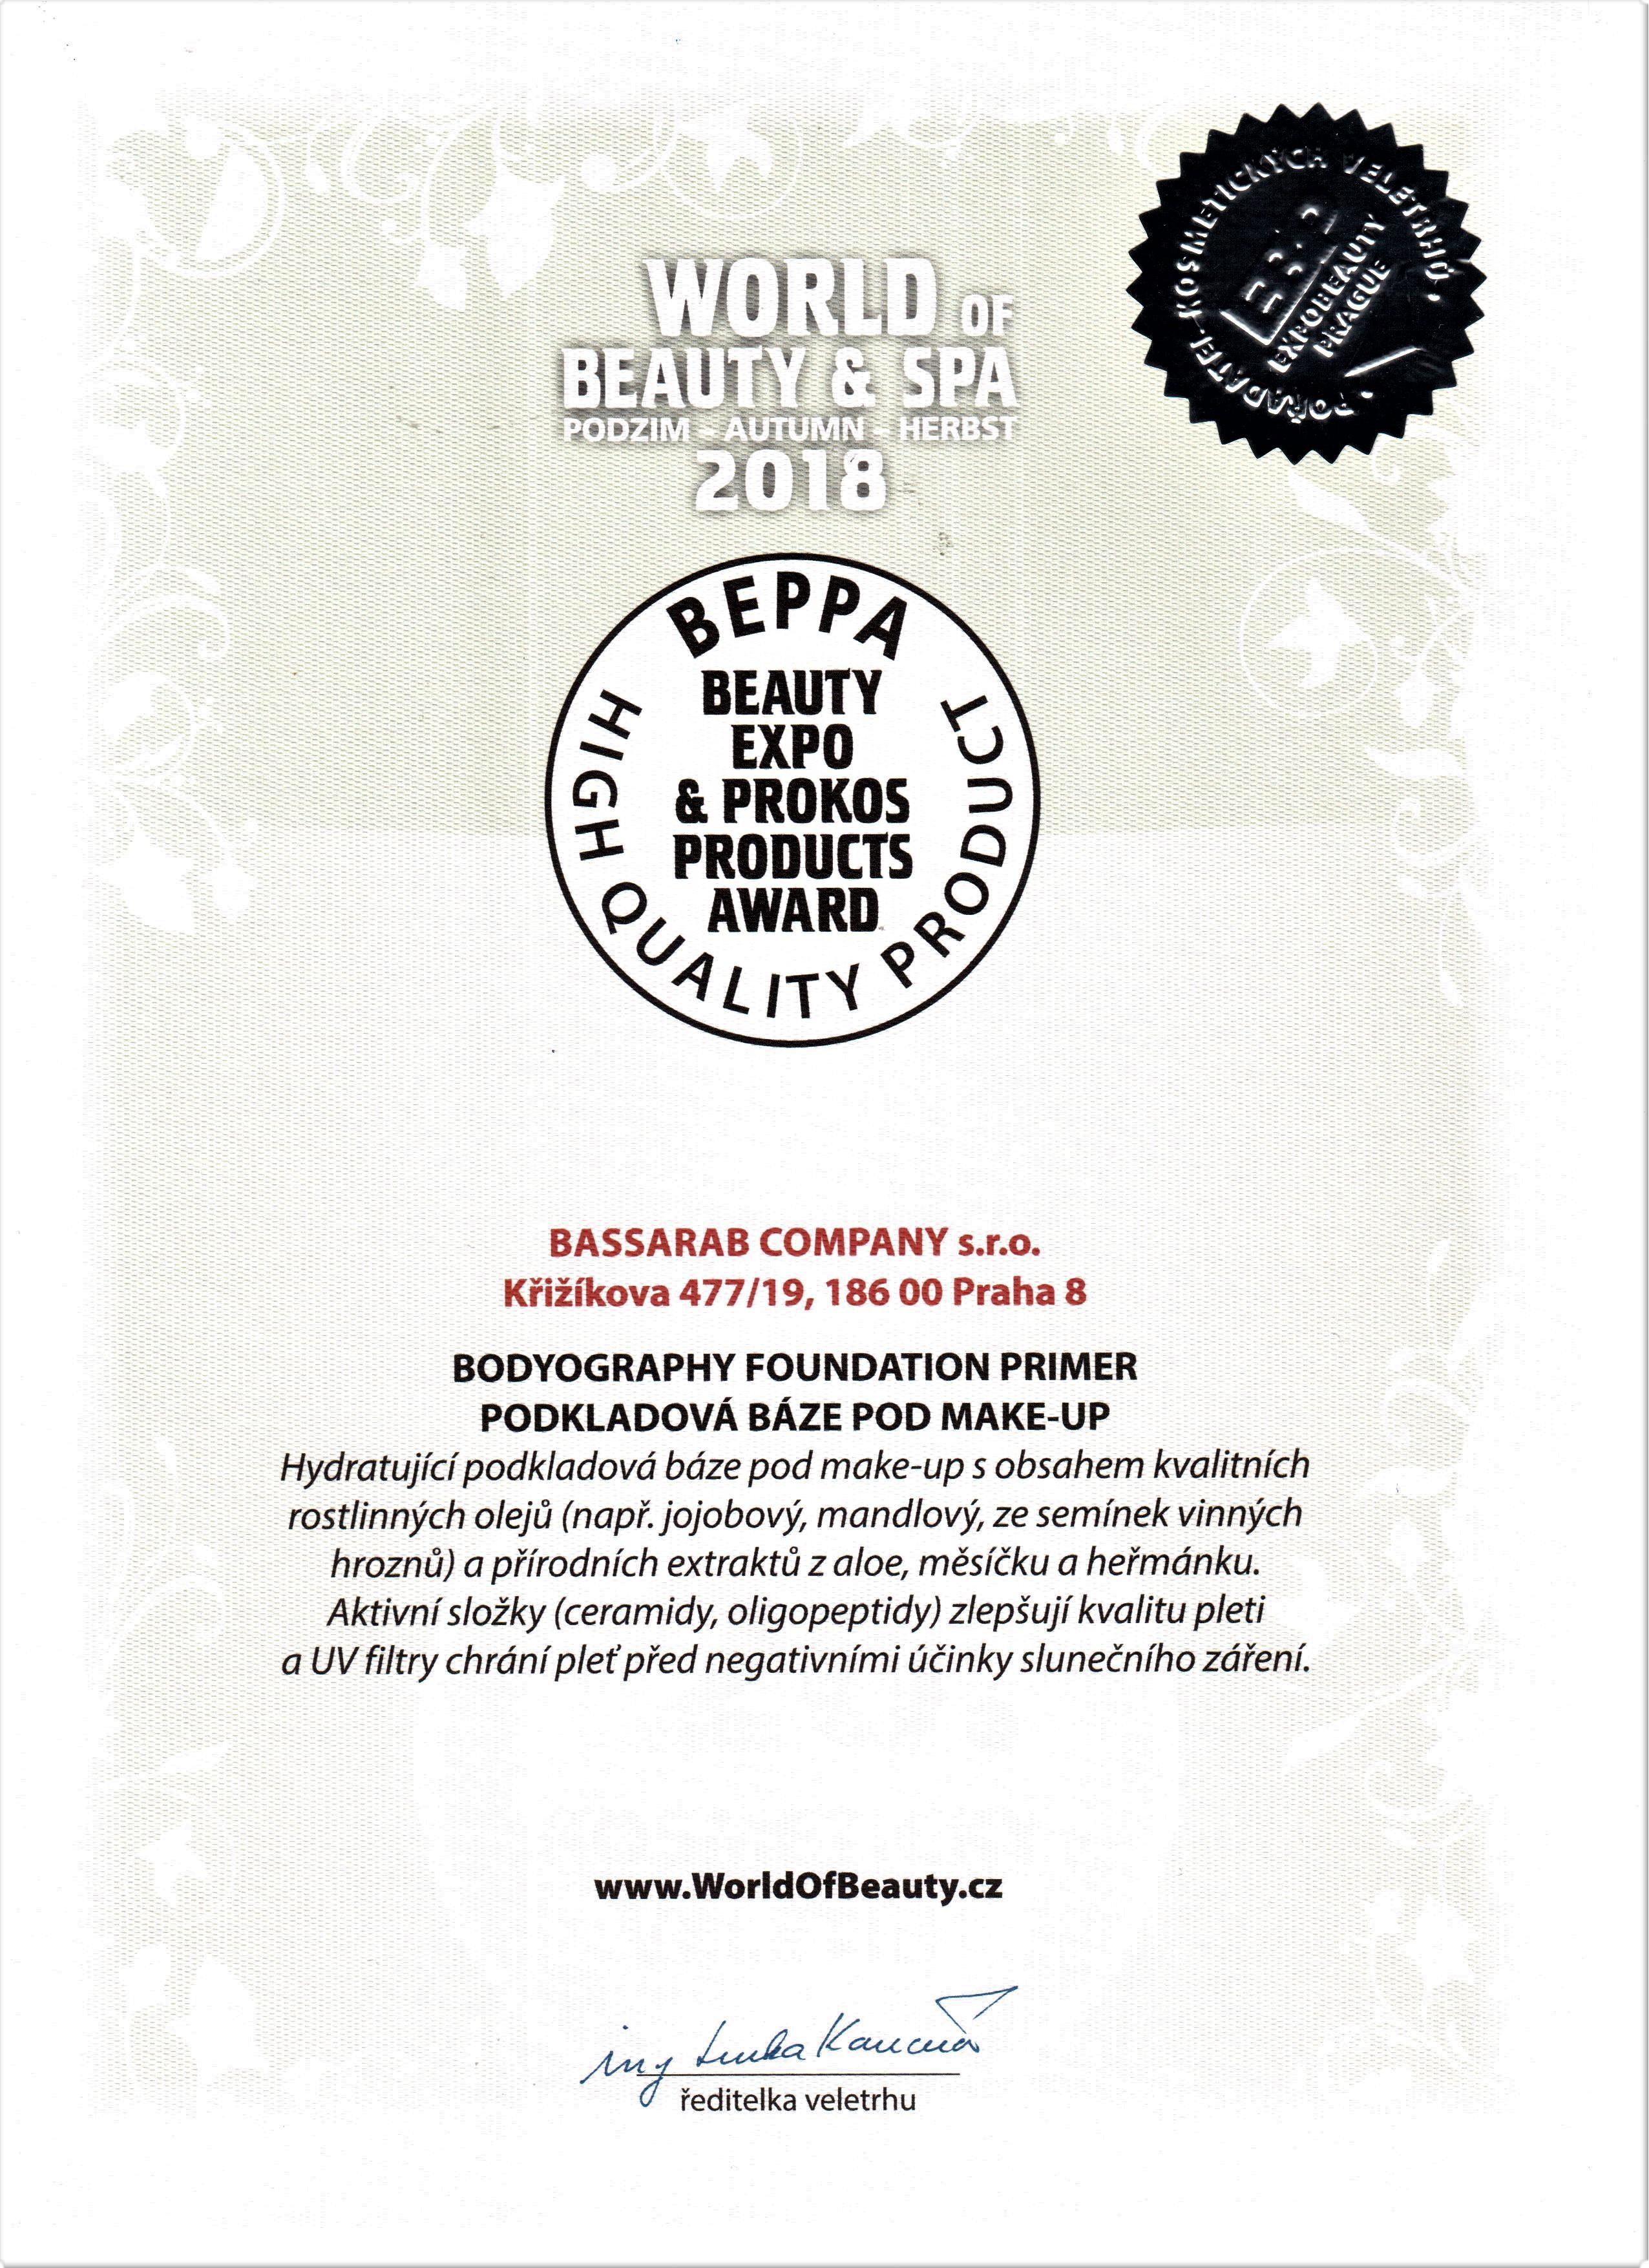 Beppa Bassarab Company.jpg